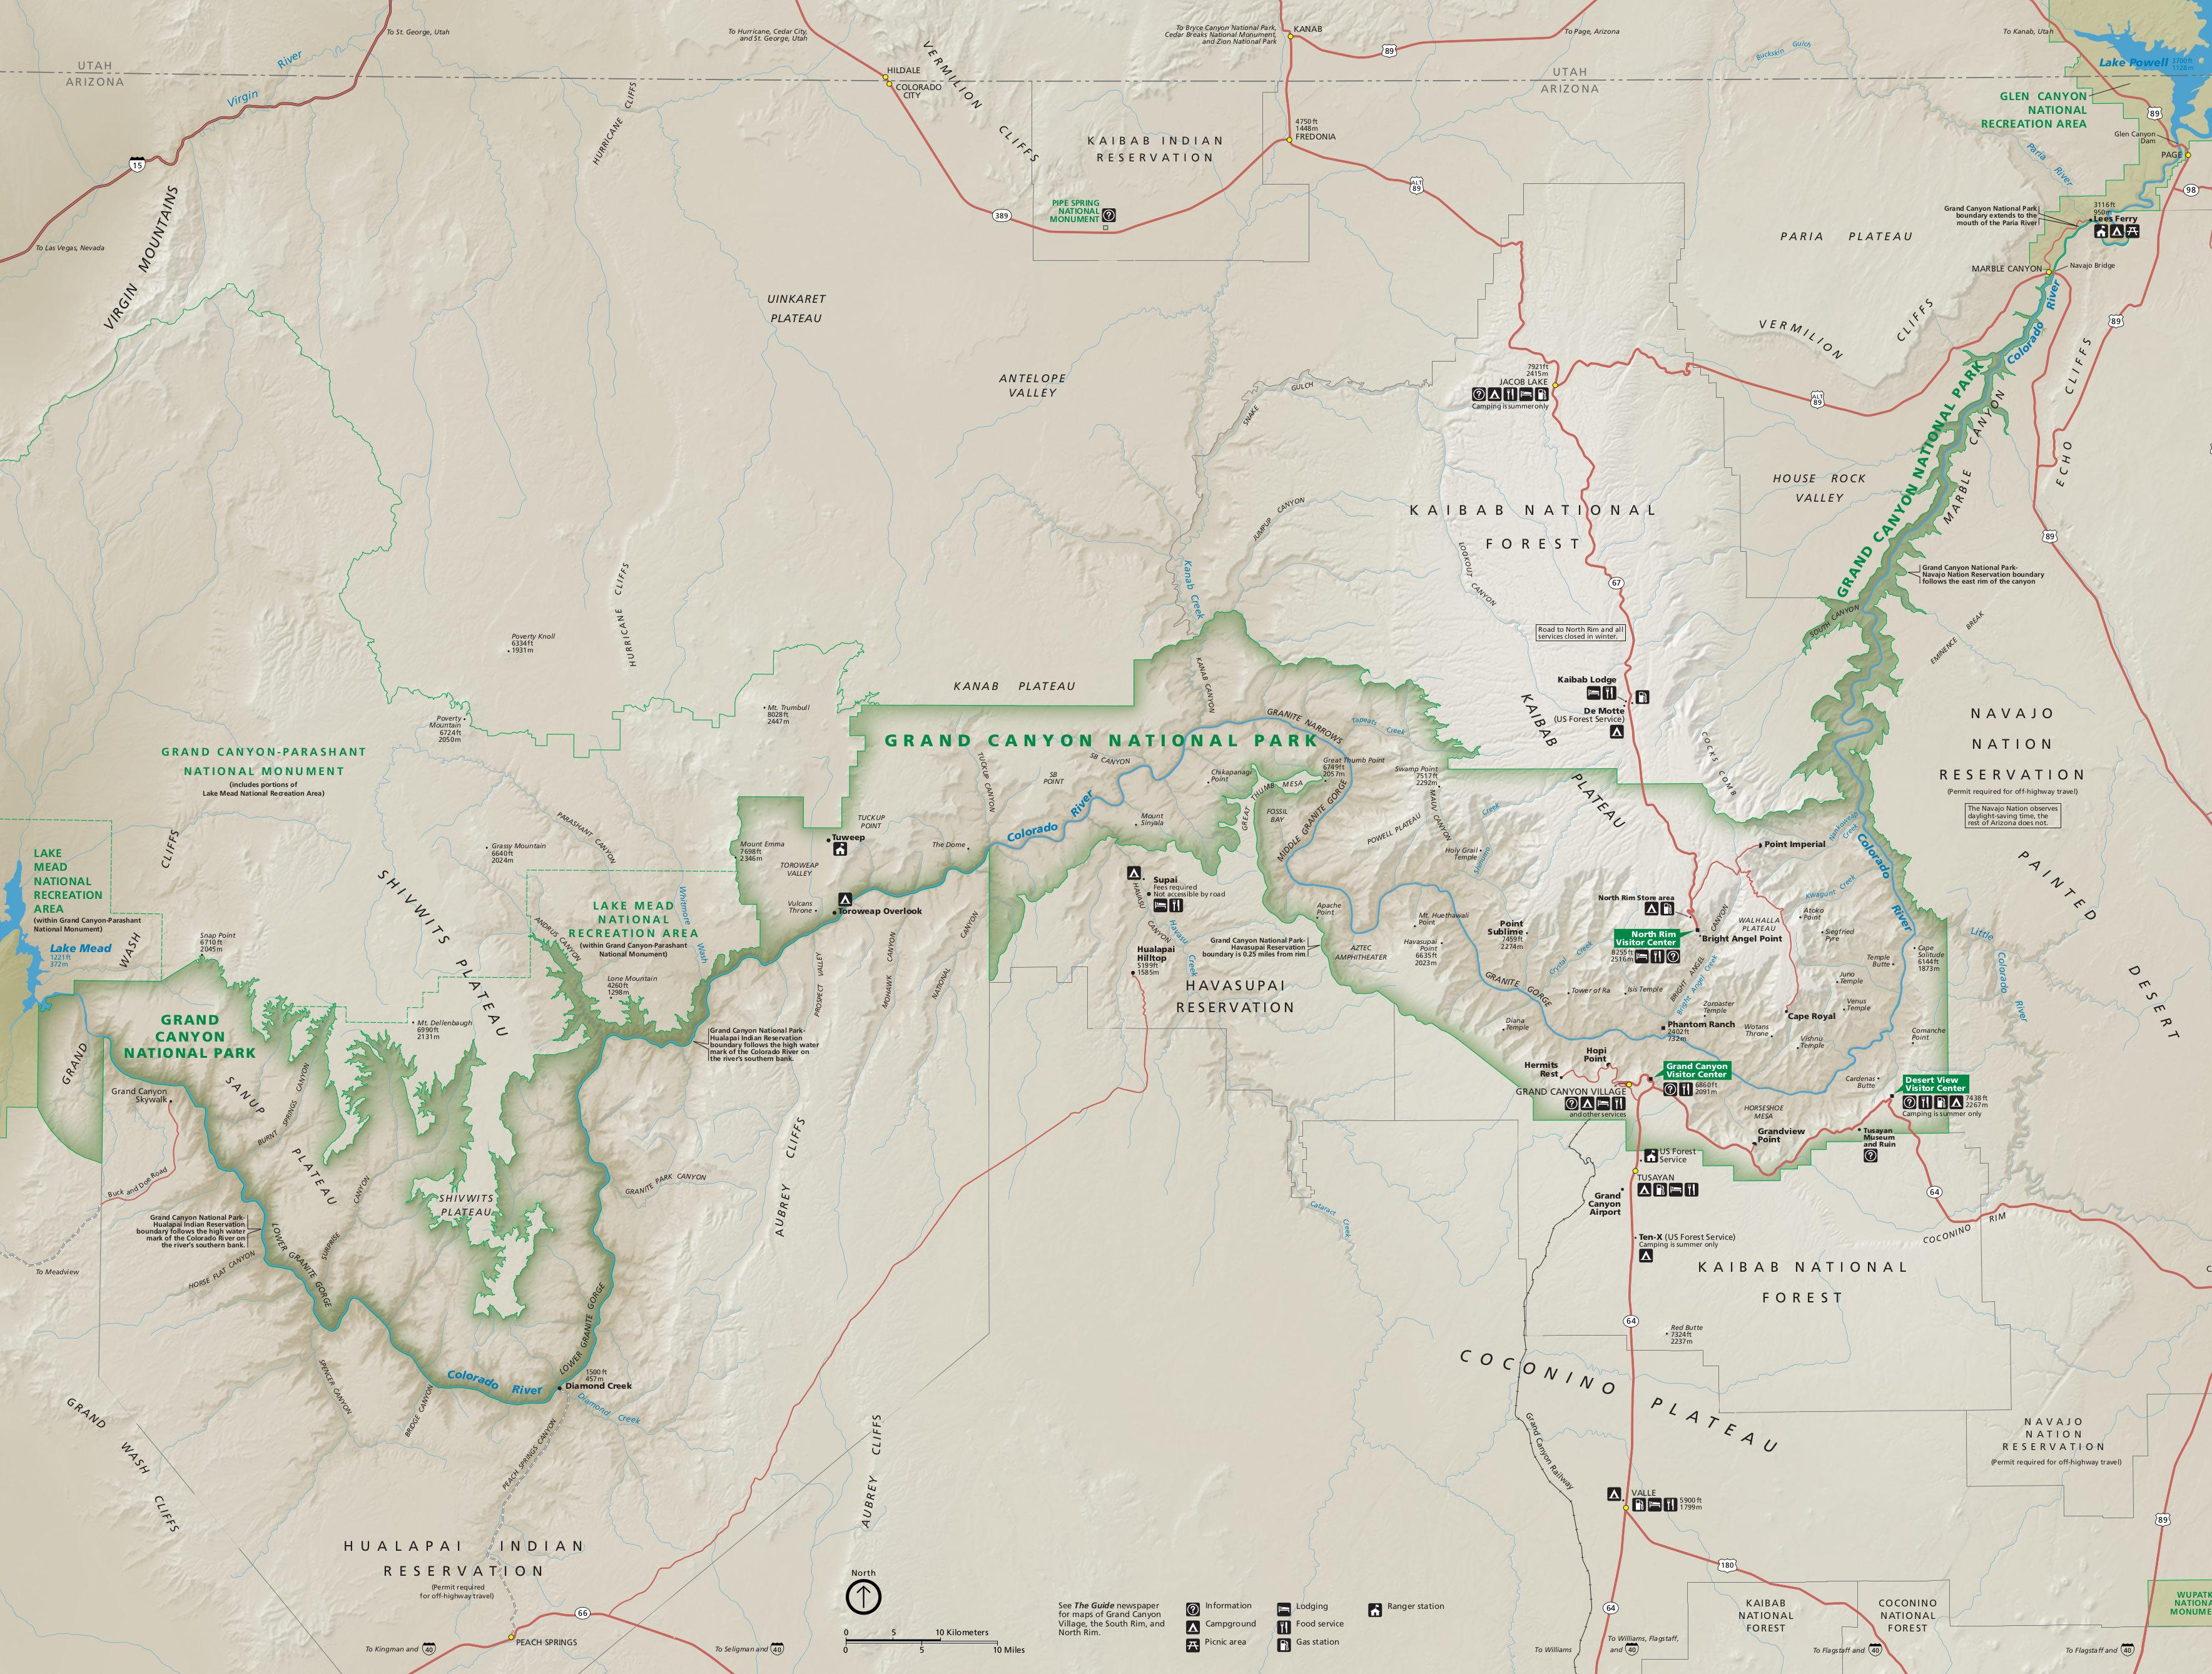 Filenps grand canyon national park mapg wikimedia commons filenps grand canyon national park mapg sciox Choice Image